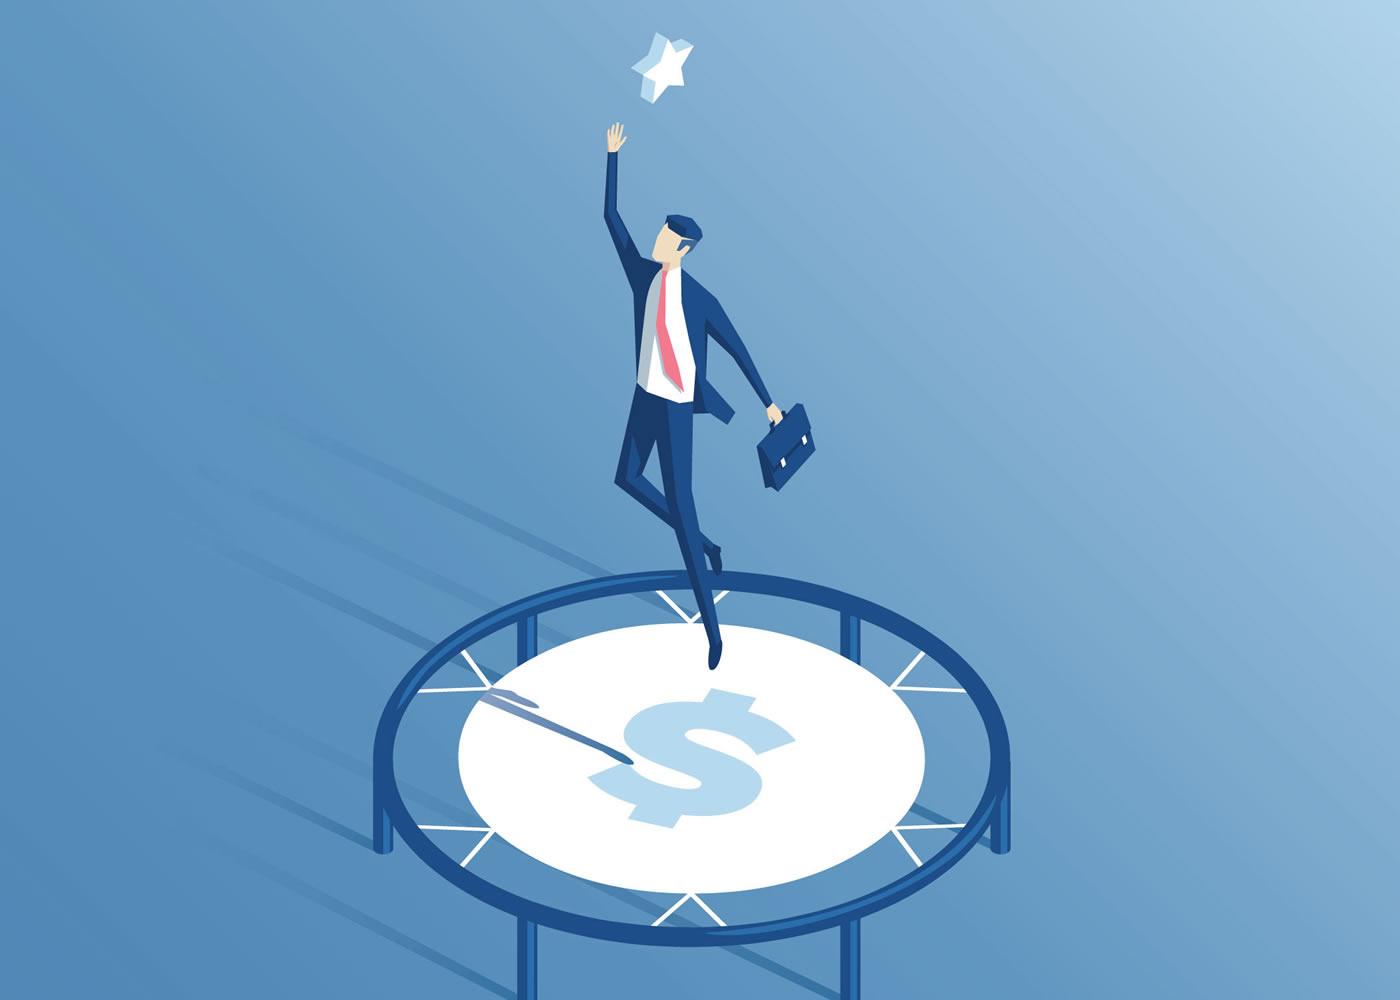 naem-2018-article-businessman-using-trampoline-trying-reach-stars-700x500